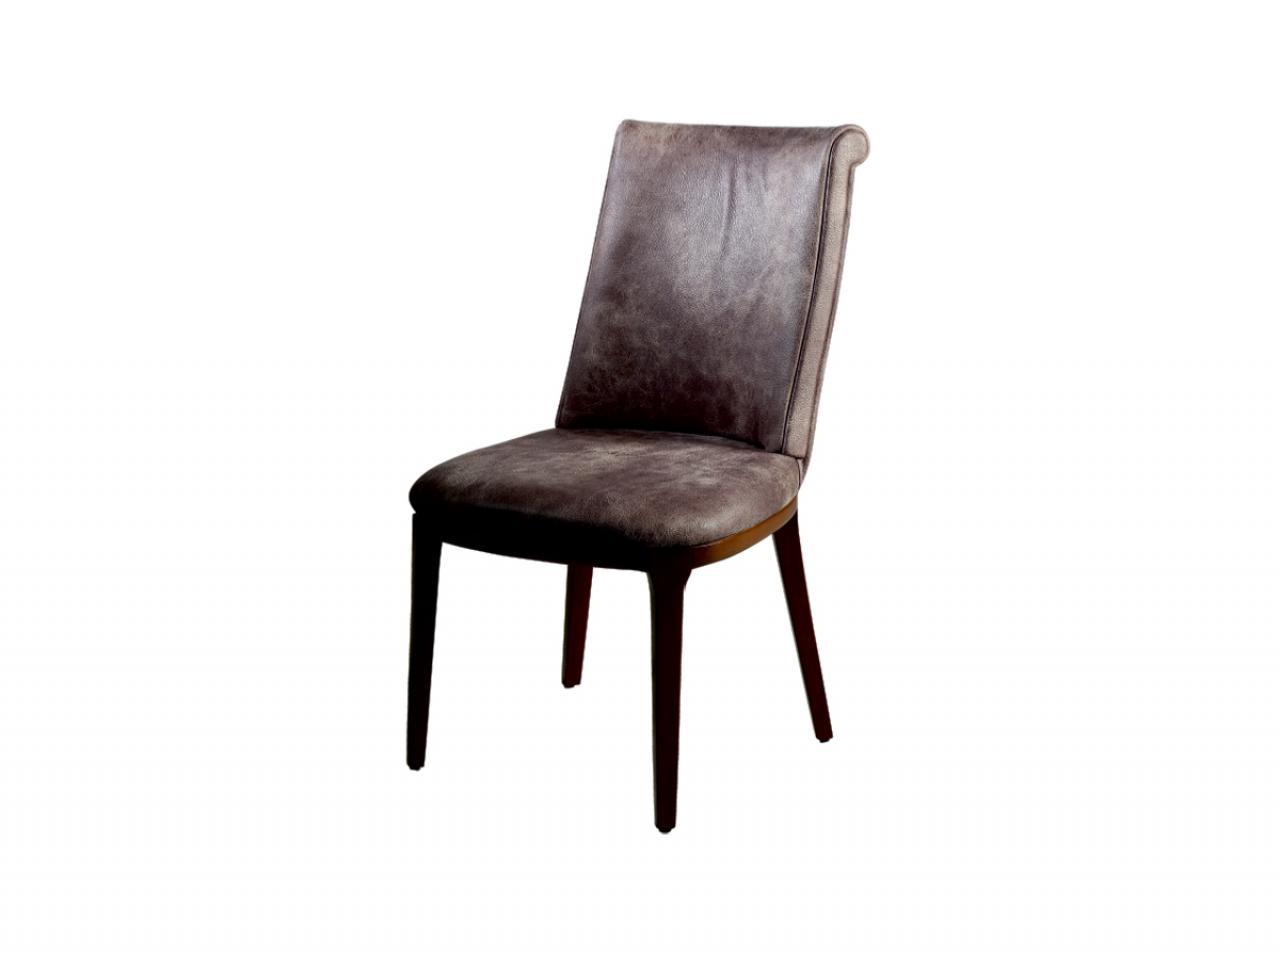 334 Sandalye